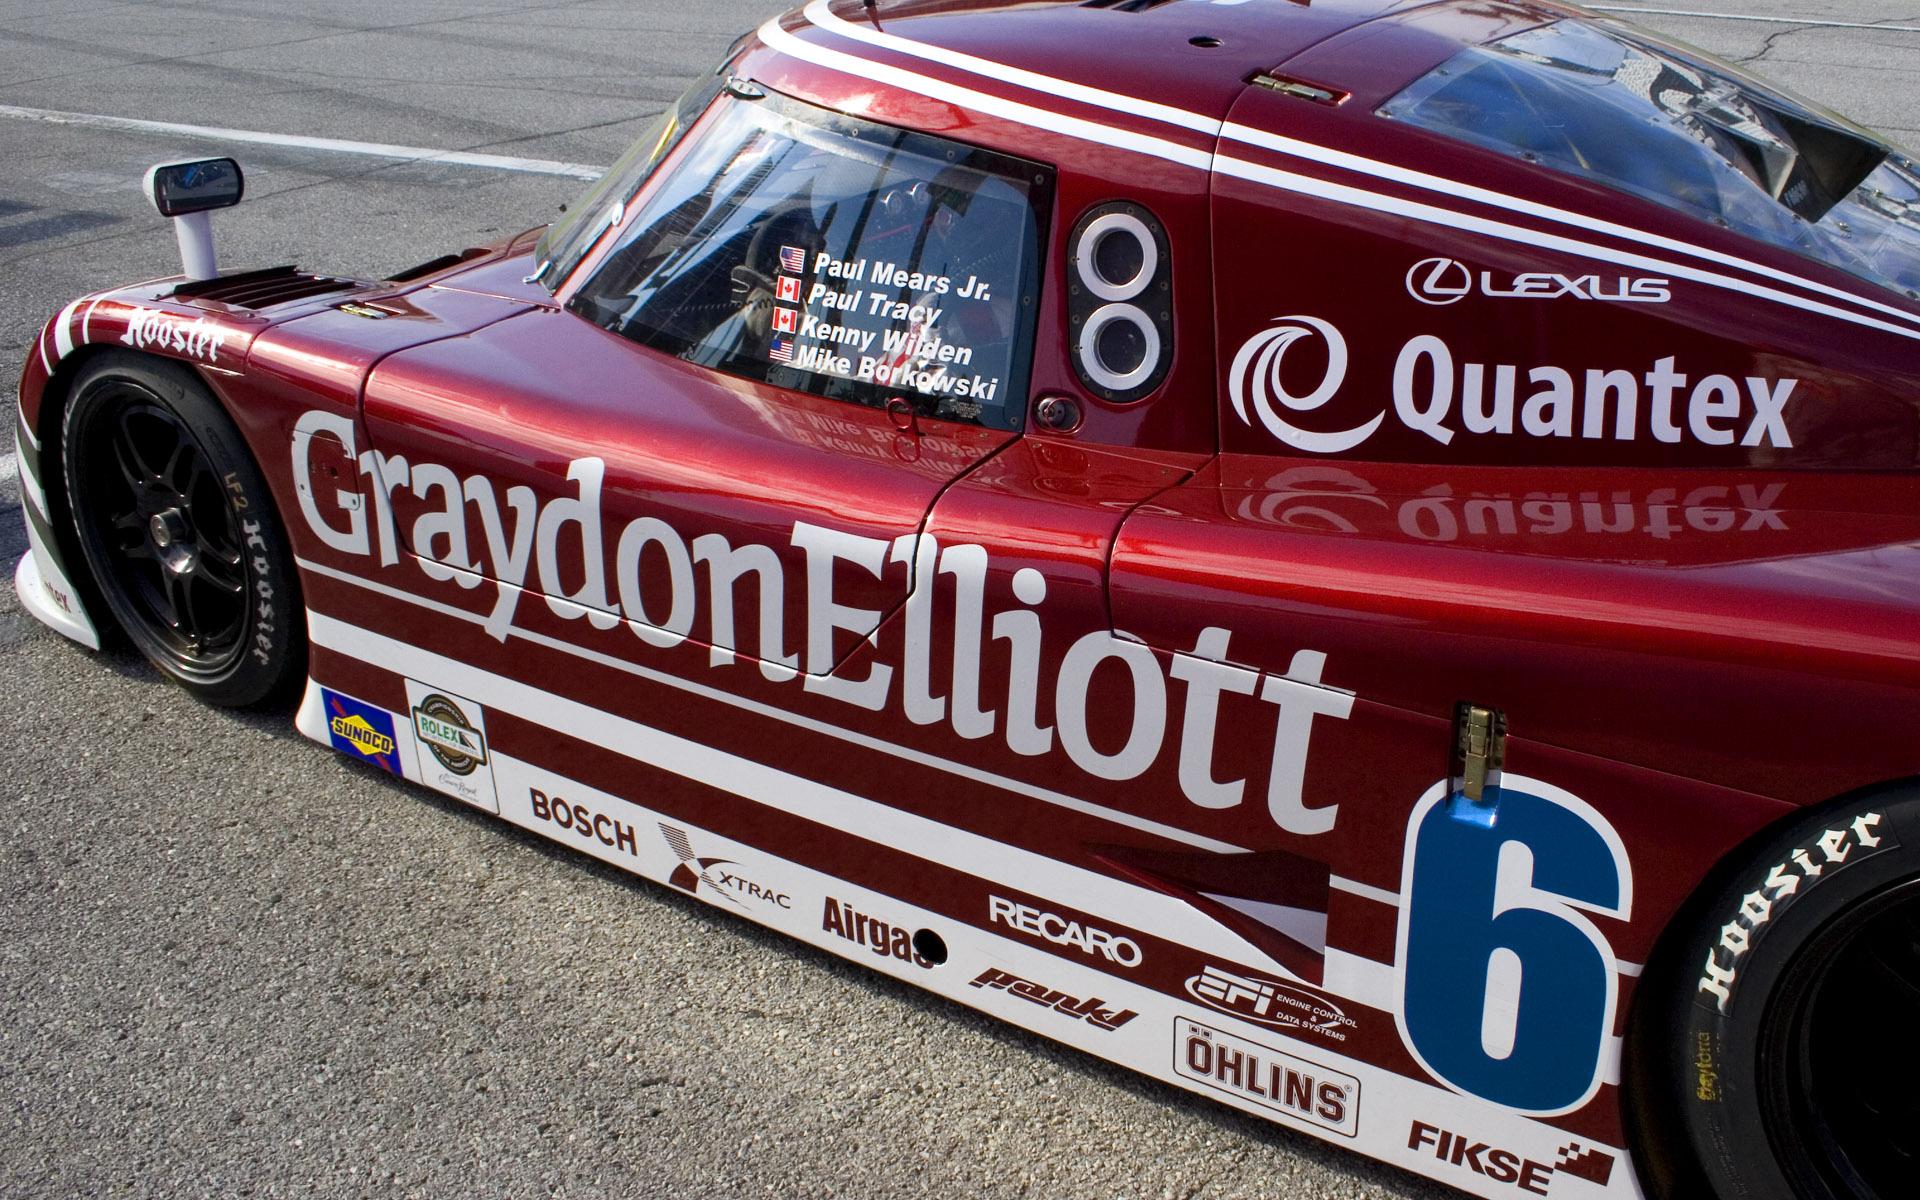 Michael Shank Racing Graydon Elliott Riley MKXI Daytona Prototype Livery